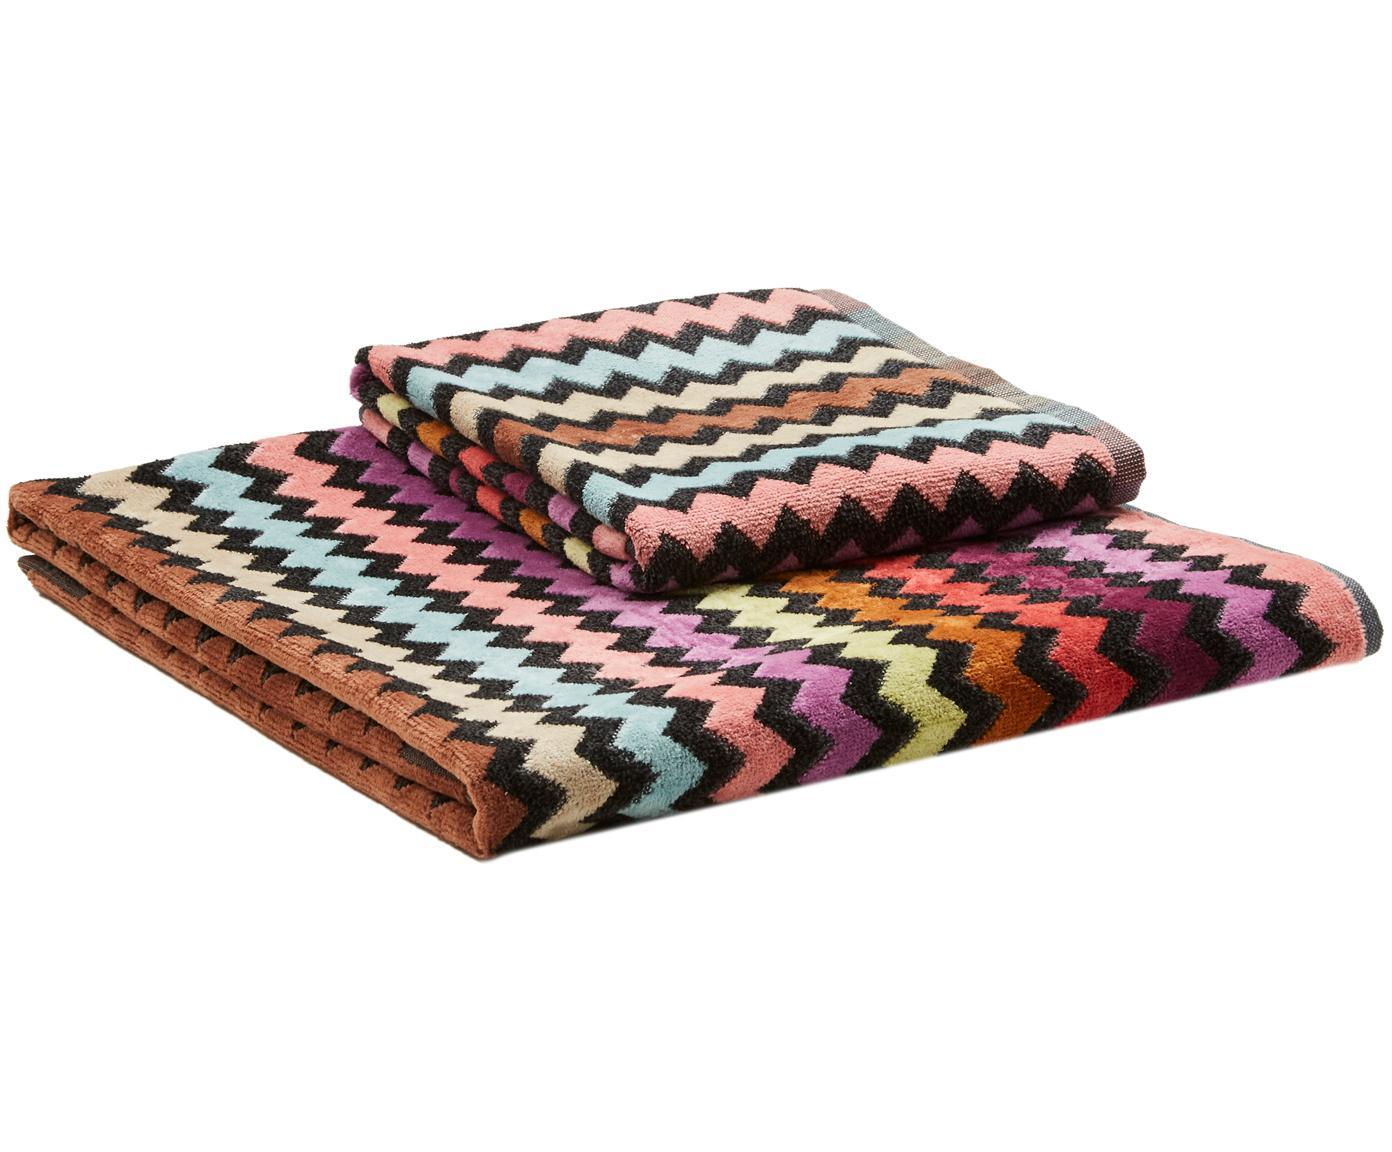 Designer Handtuch-Set Warner, 2-tlg., Webart: Veloursfrottee, Mehrfarbig, Sondergrößen